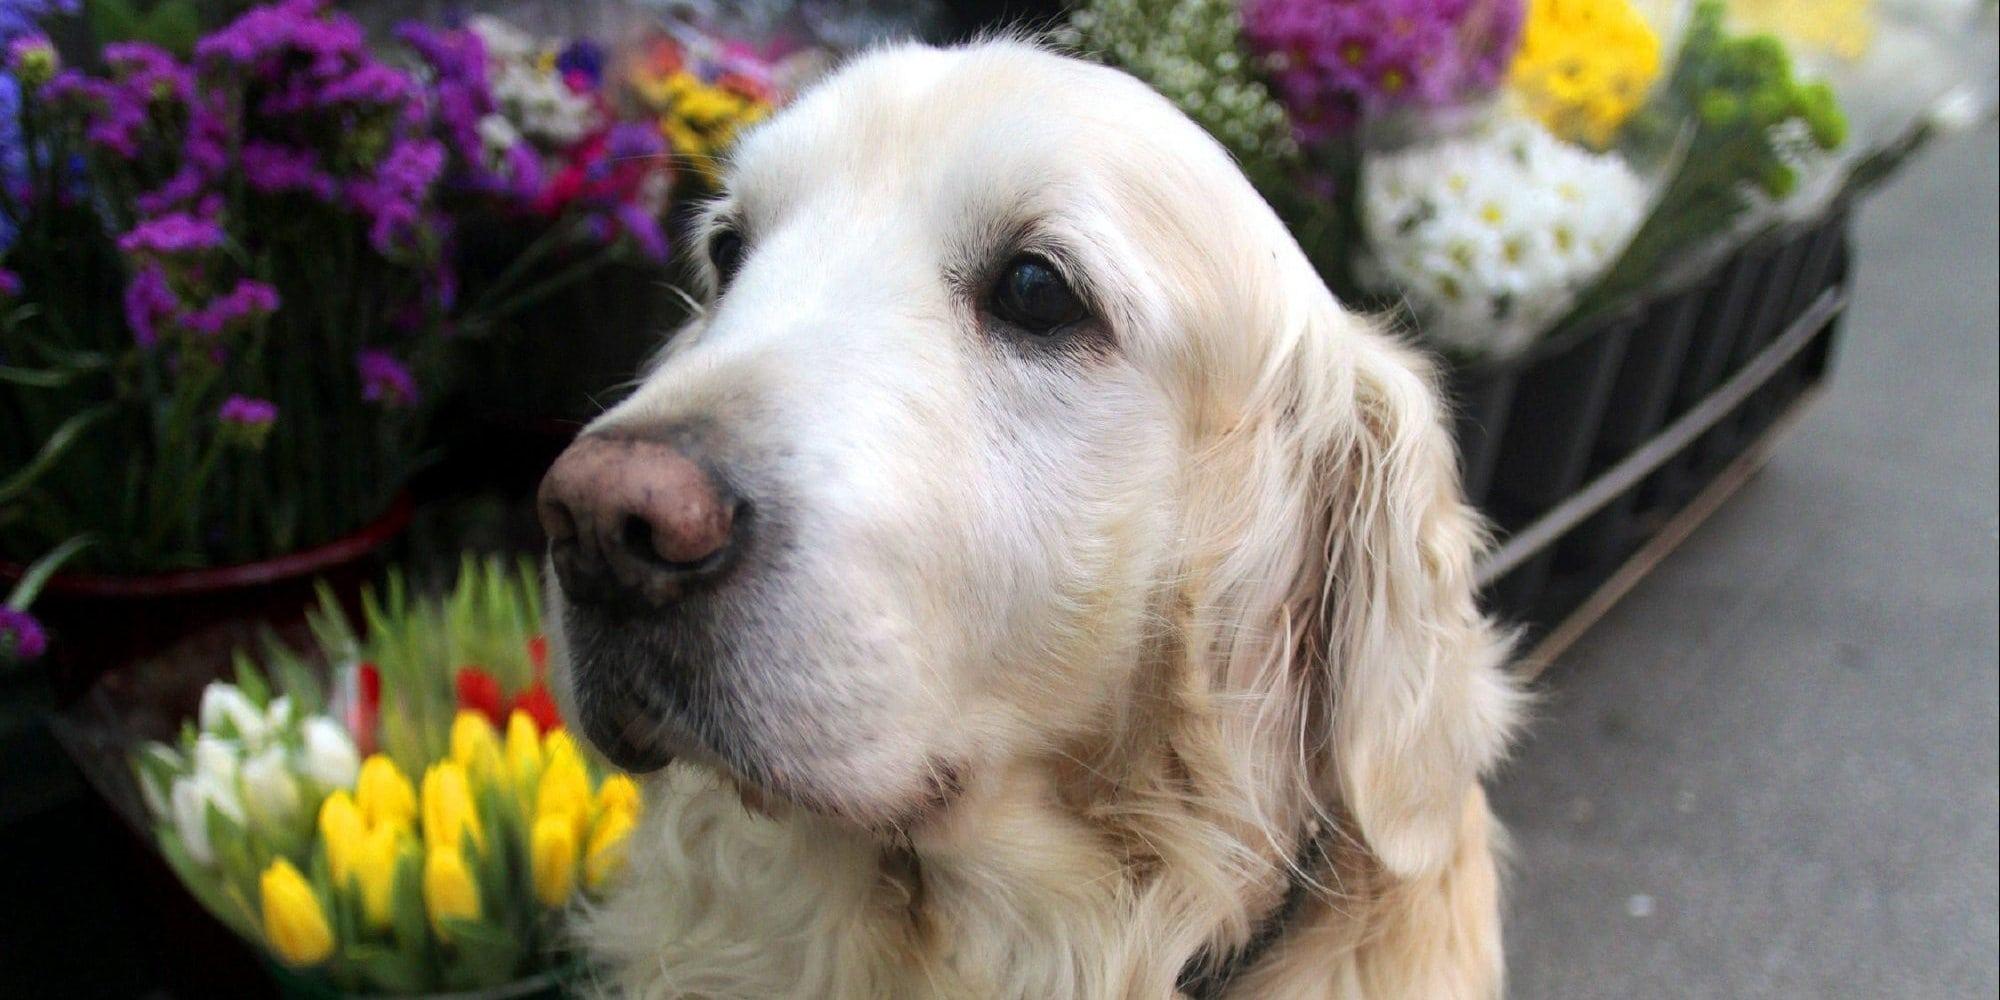 Lugo Plaza's Friendliest Dog Passes Away